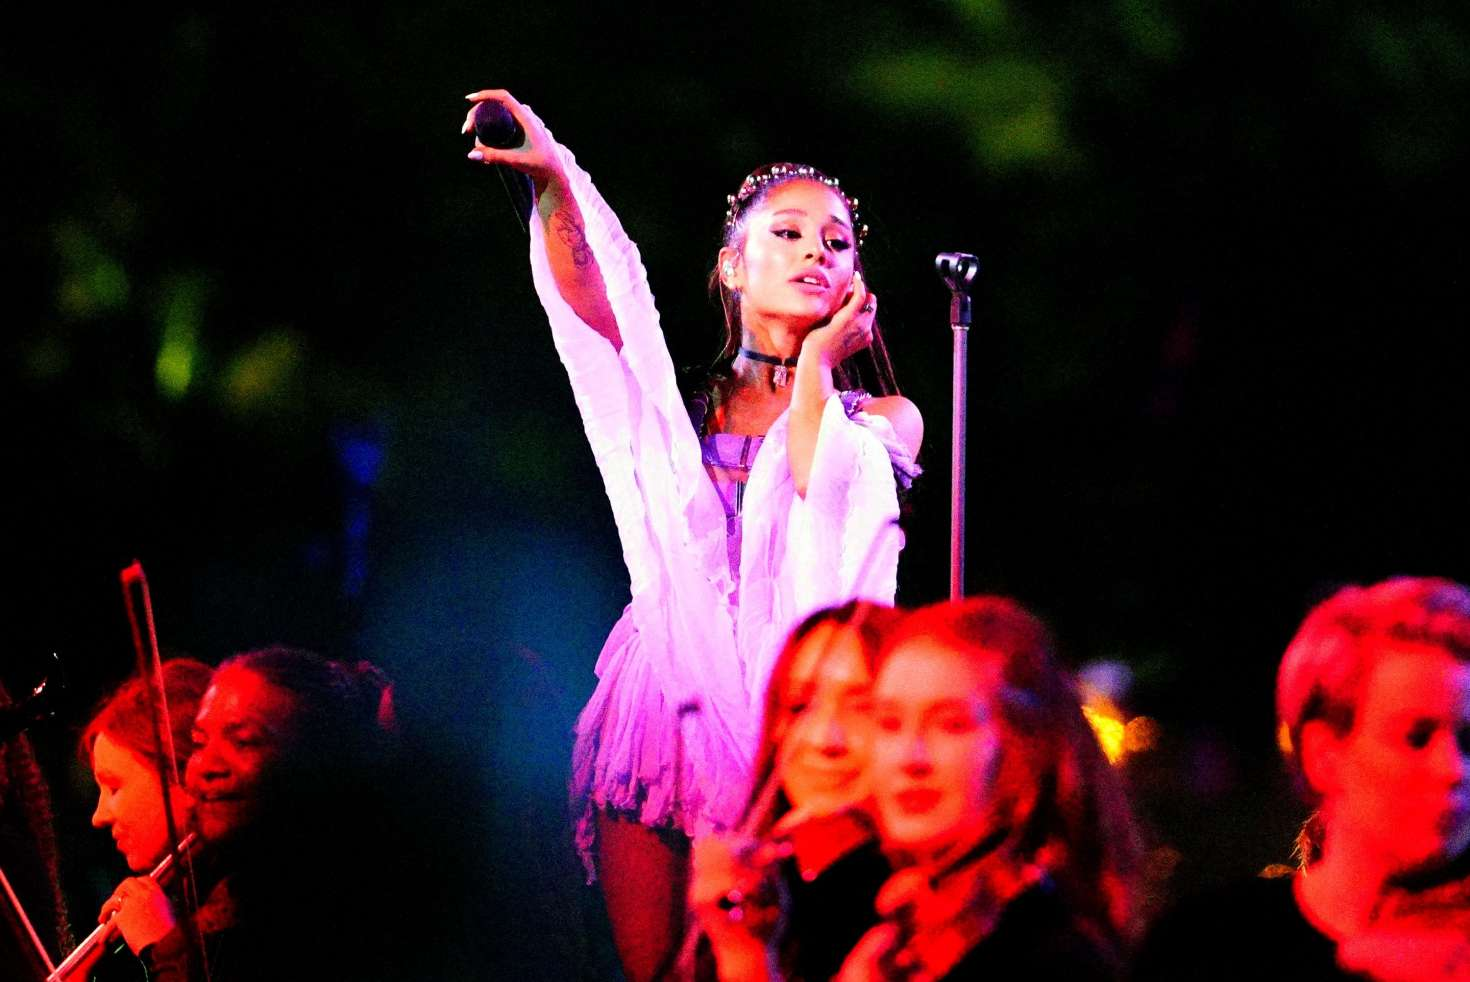 Ariana Grande 2019 : Ariana Grande: Performance at Coachella -08